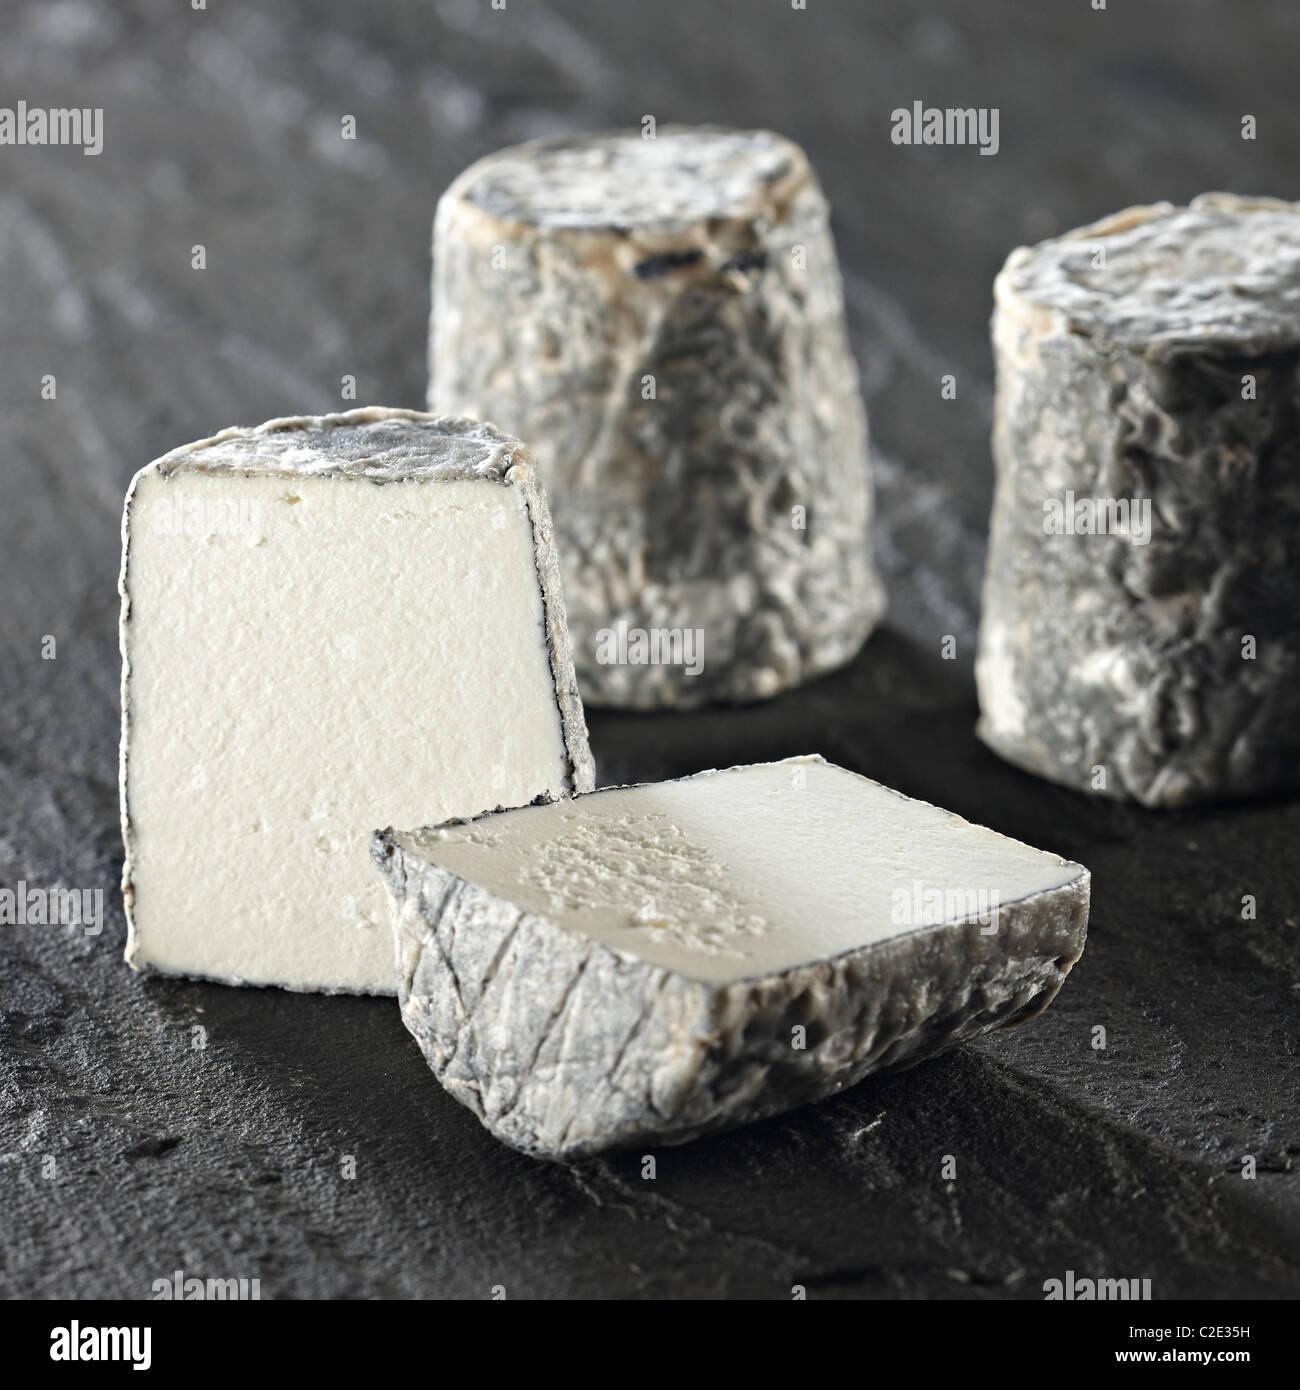 Dorstone goats cheese - Stock Image